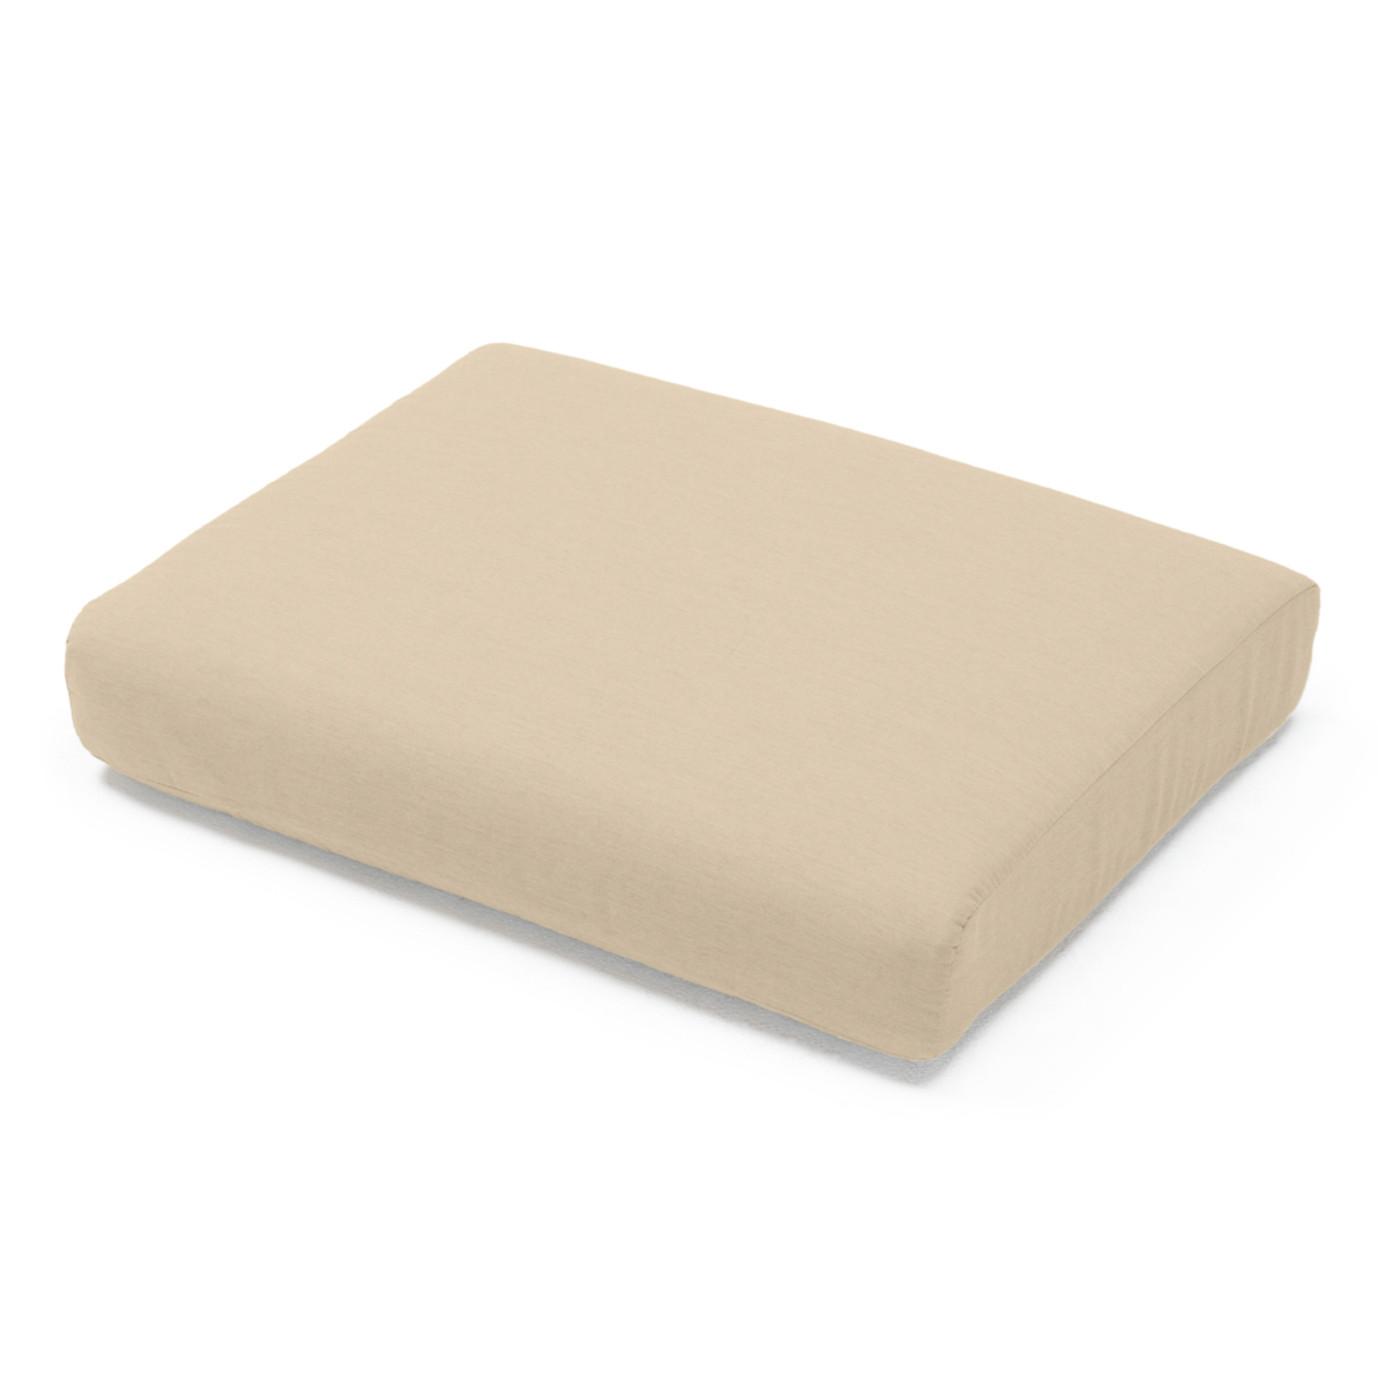 Portofino Comfort Club Ottoman Cushion - Heather Beige